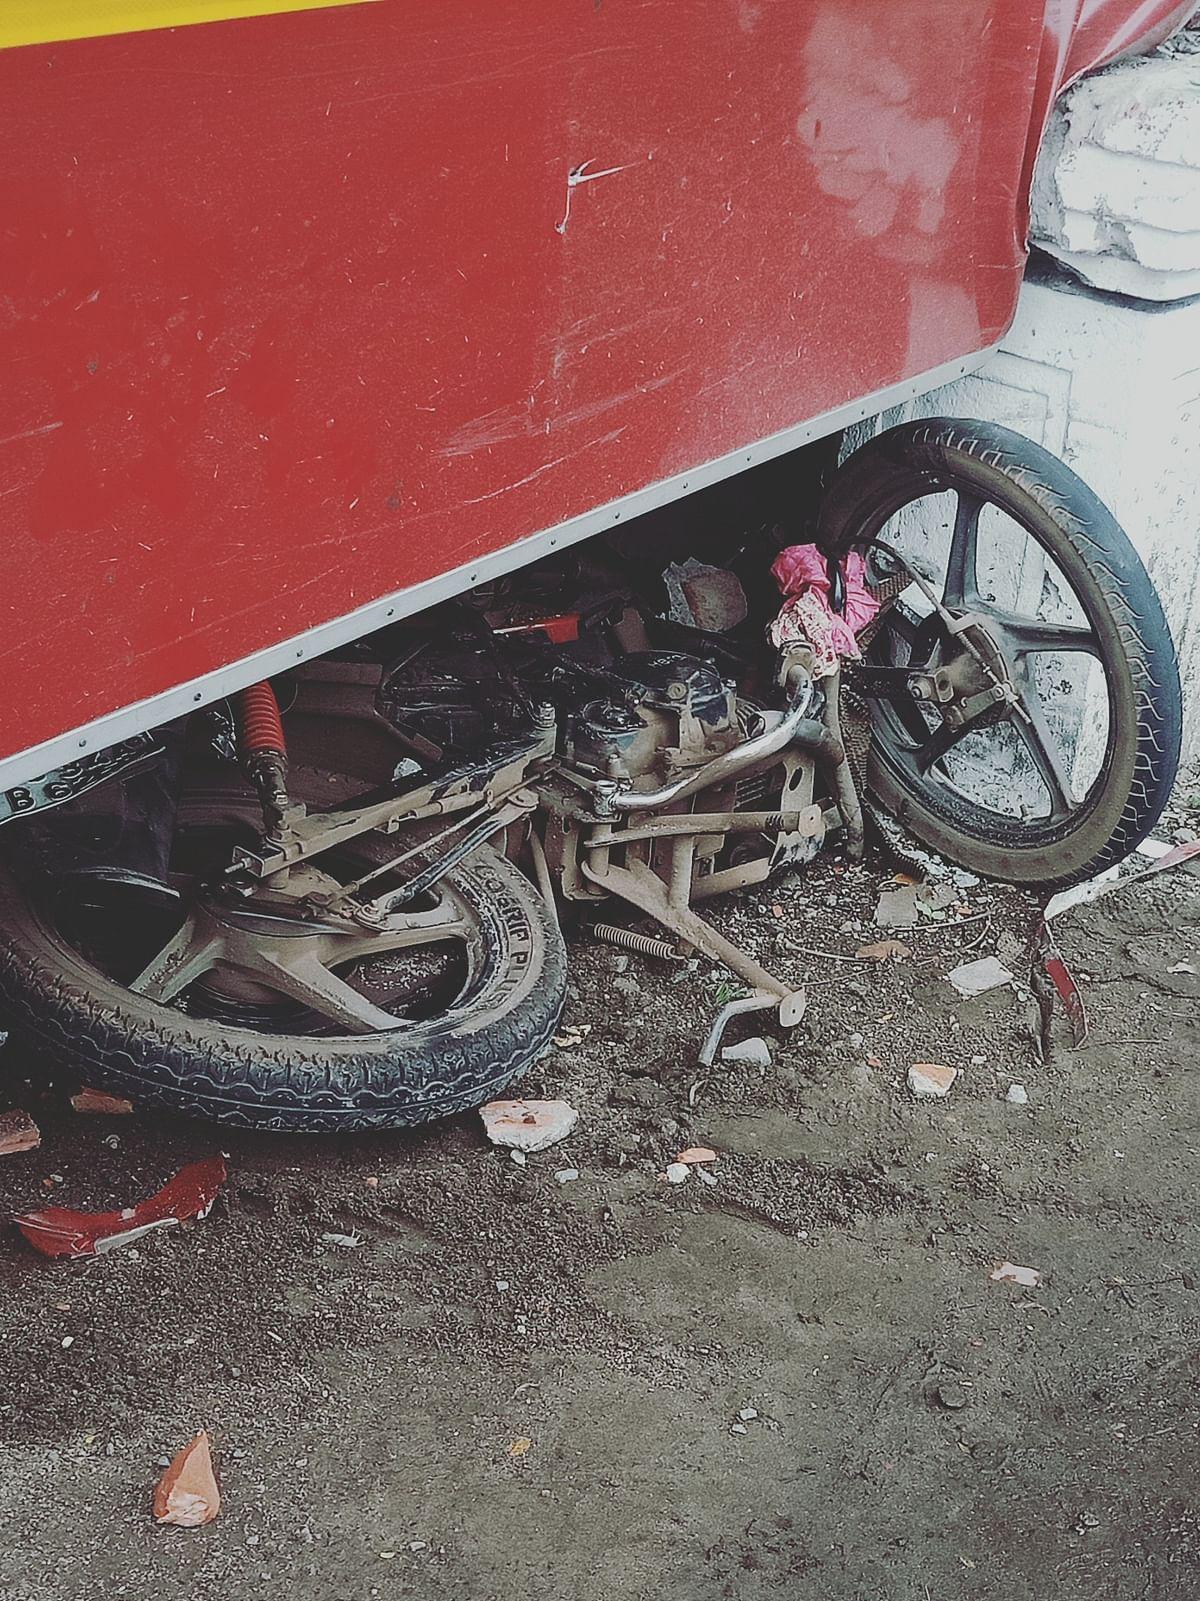 मिनी बस ने बाइक को रौंदा